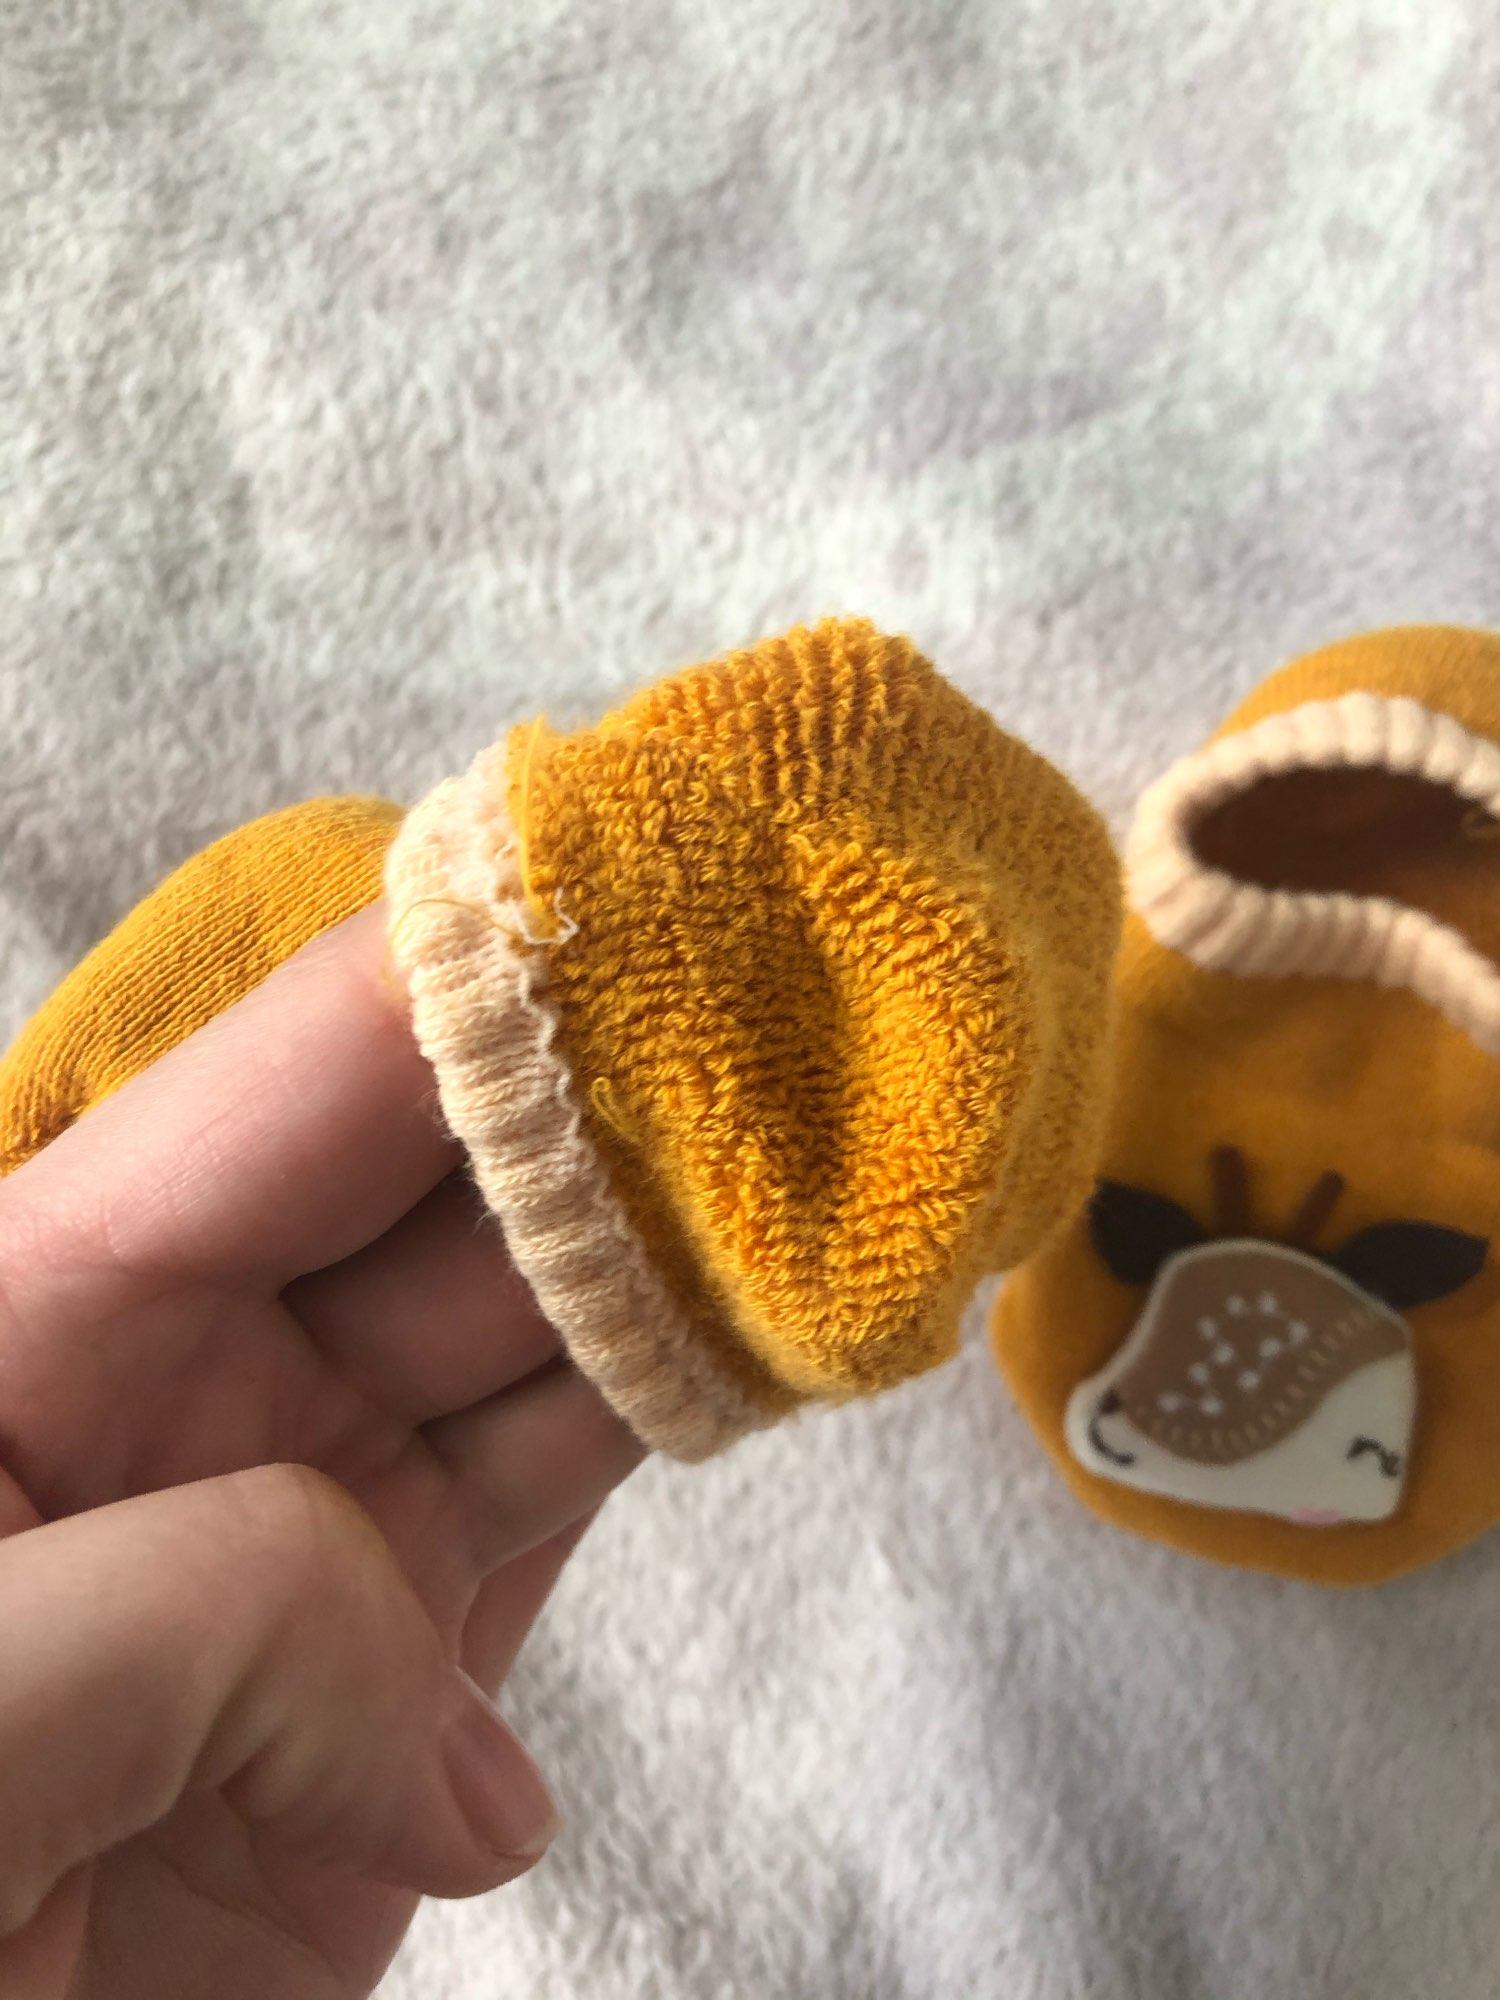 Autumn Winter Thicken Cotton Baby Boys Girls Low Cut Ankle Socks Rubber Slip-resistant Floor Socks Infant Kids Socks Soft Shoes photo review